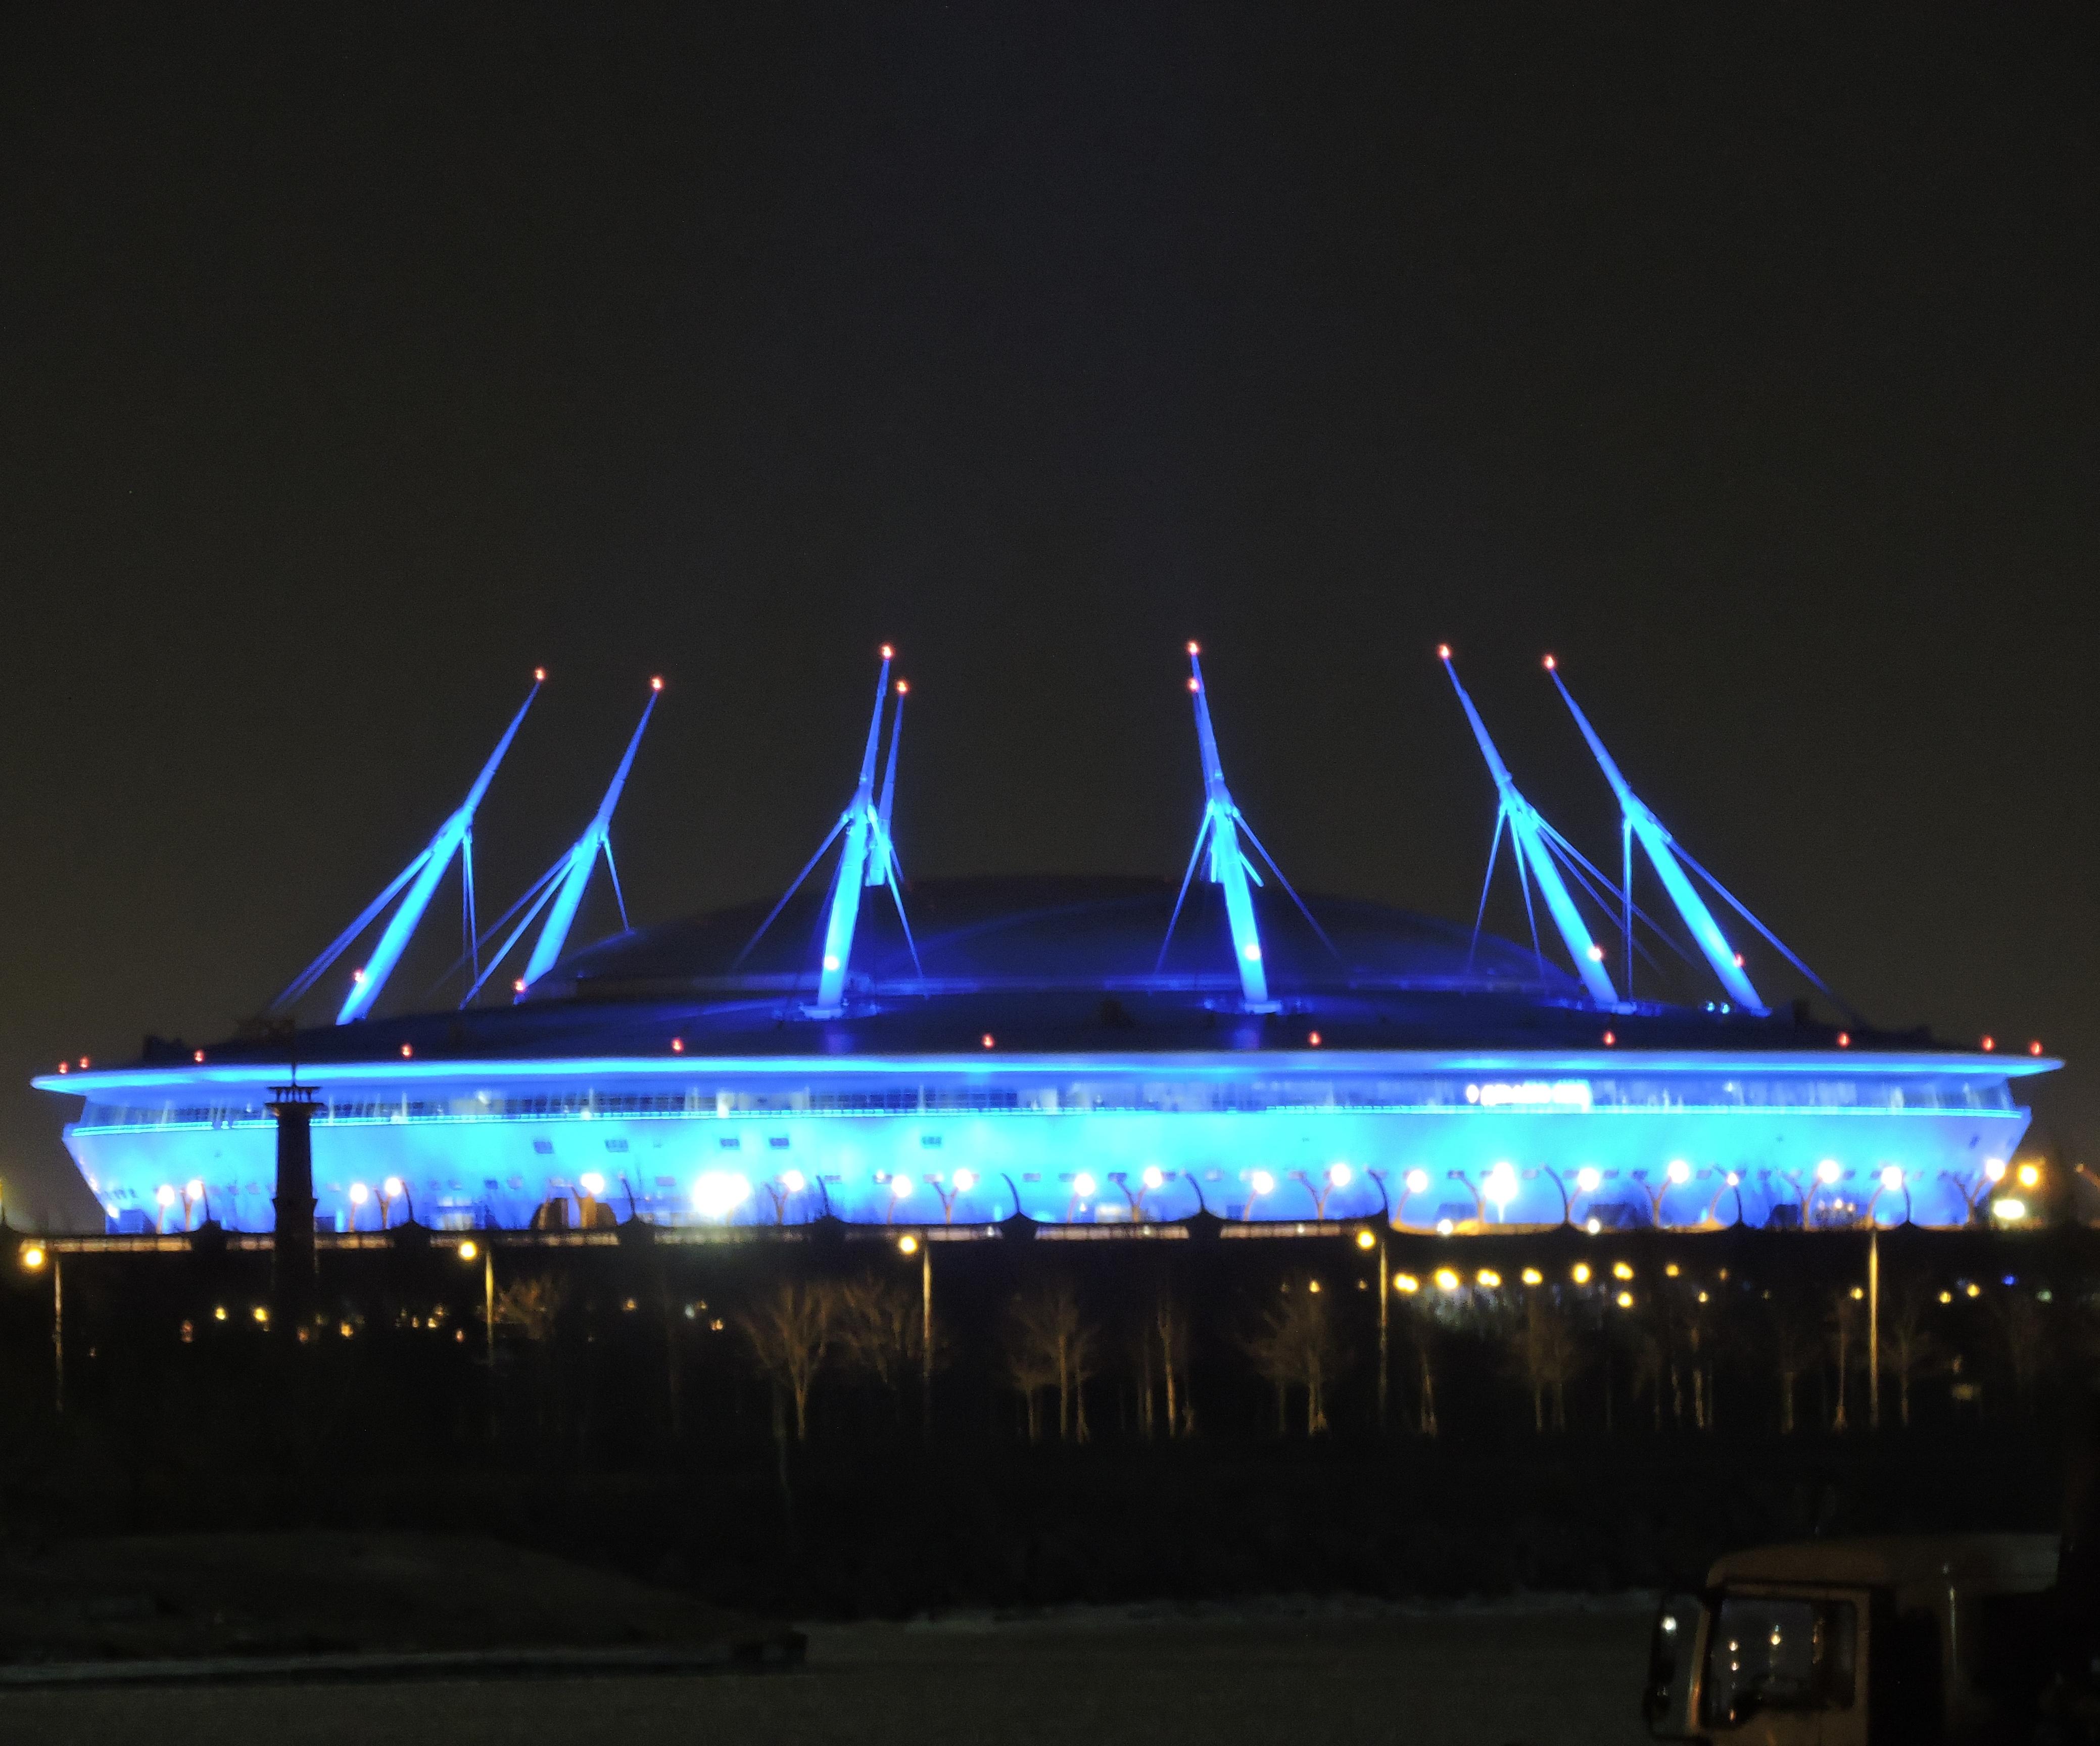 File:Krestovsky Stadium at night.jpg - Wikimedia Commons